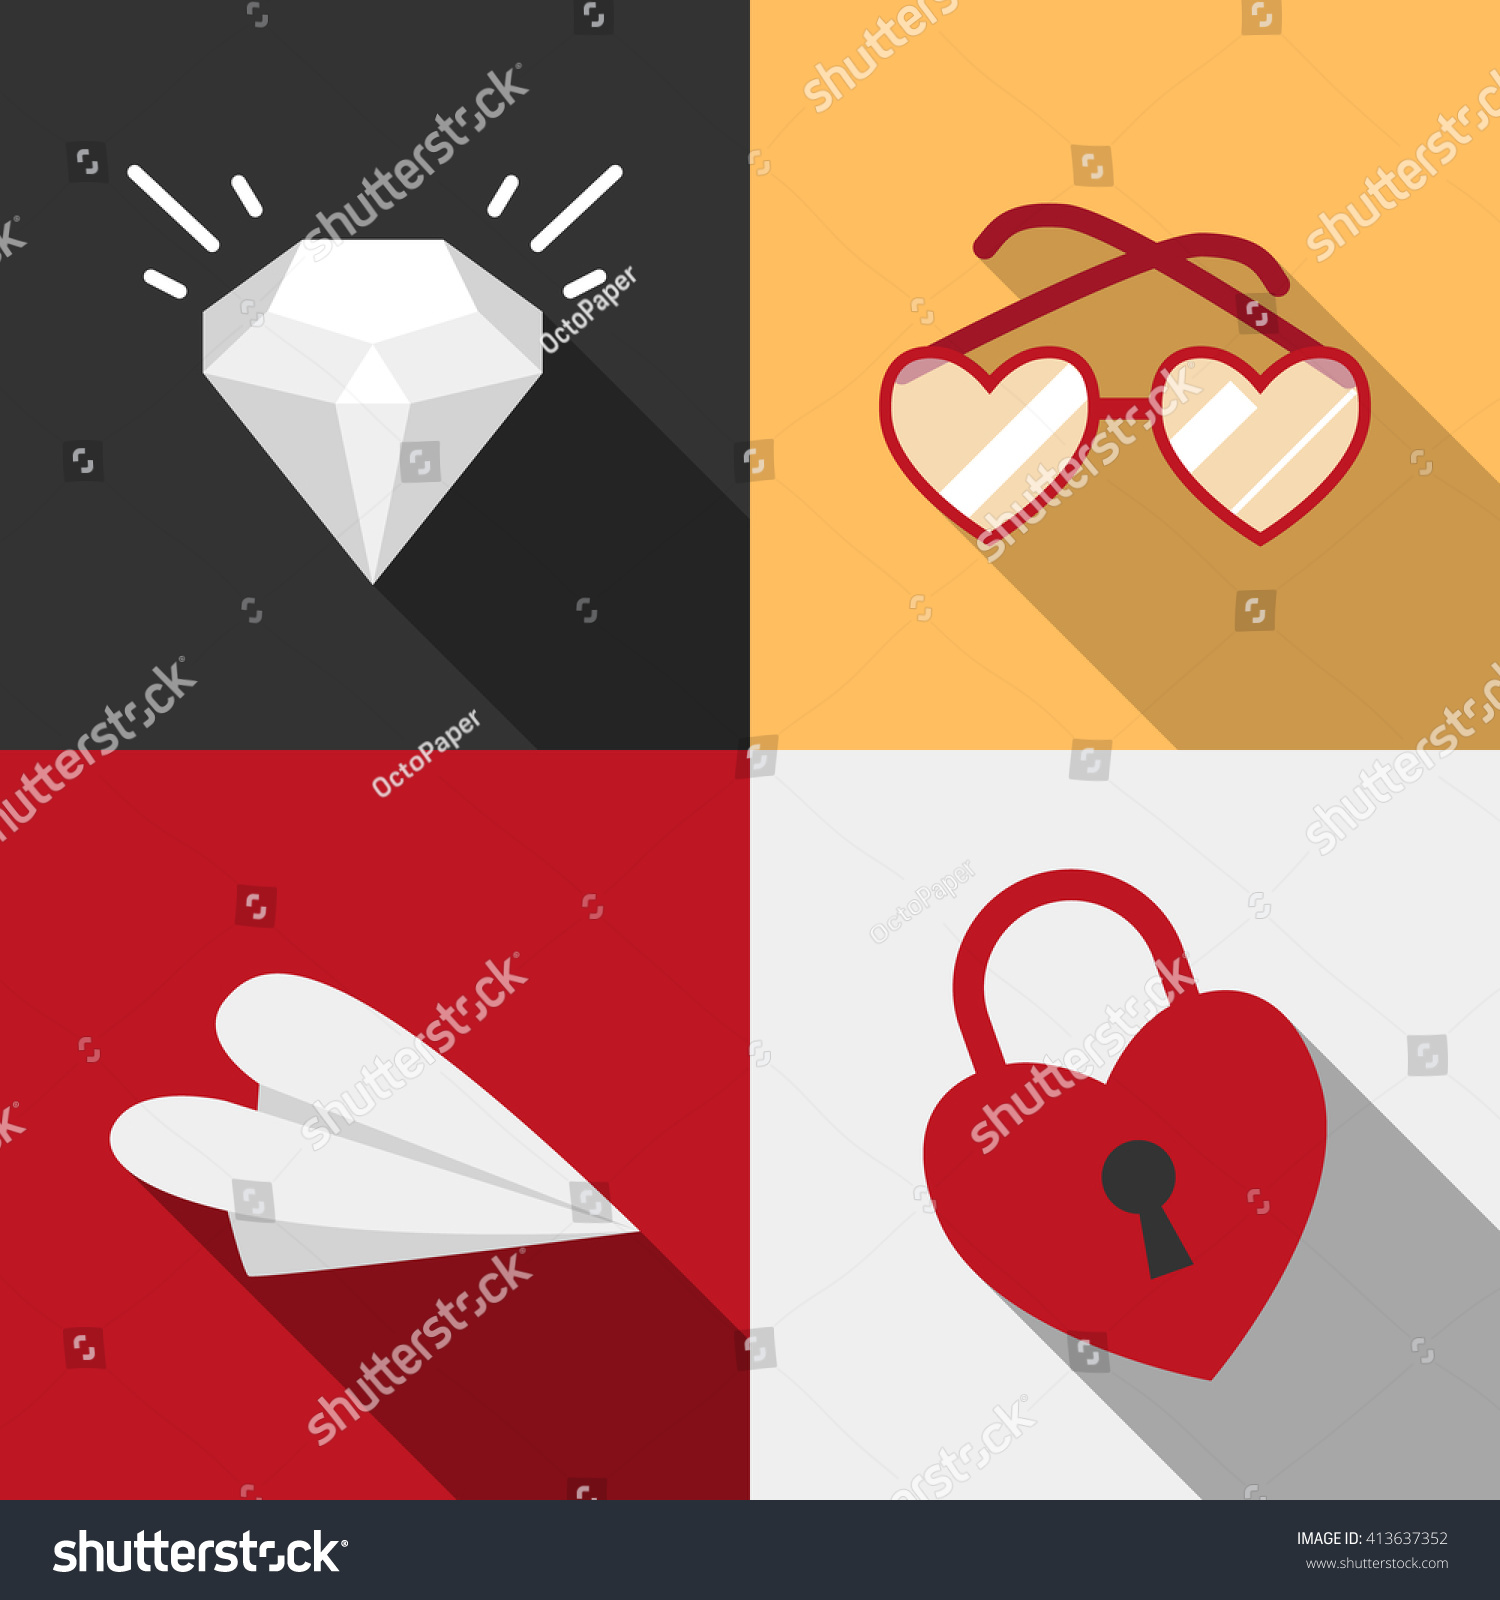 Dating sites symbols